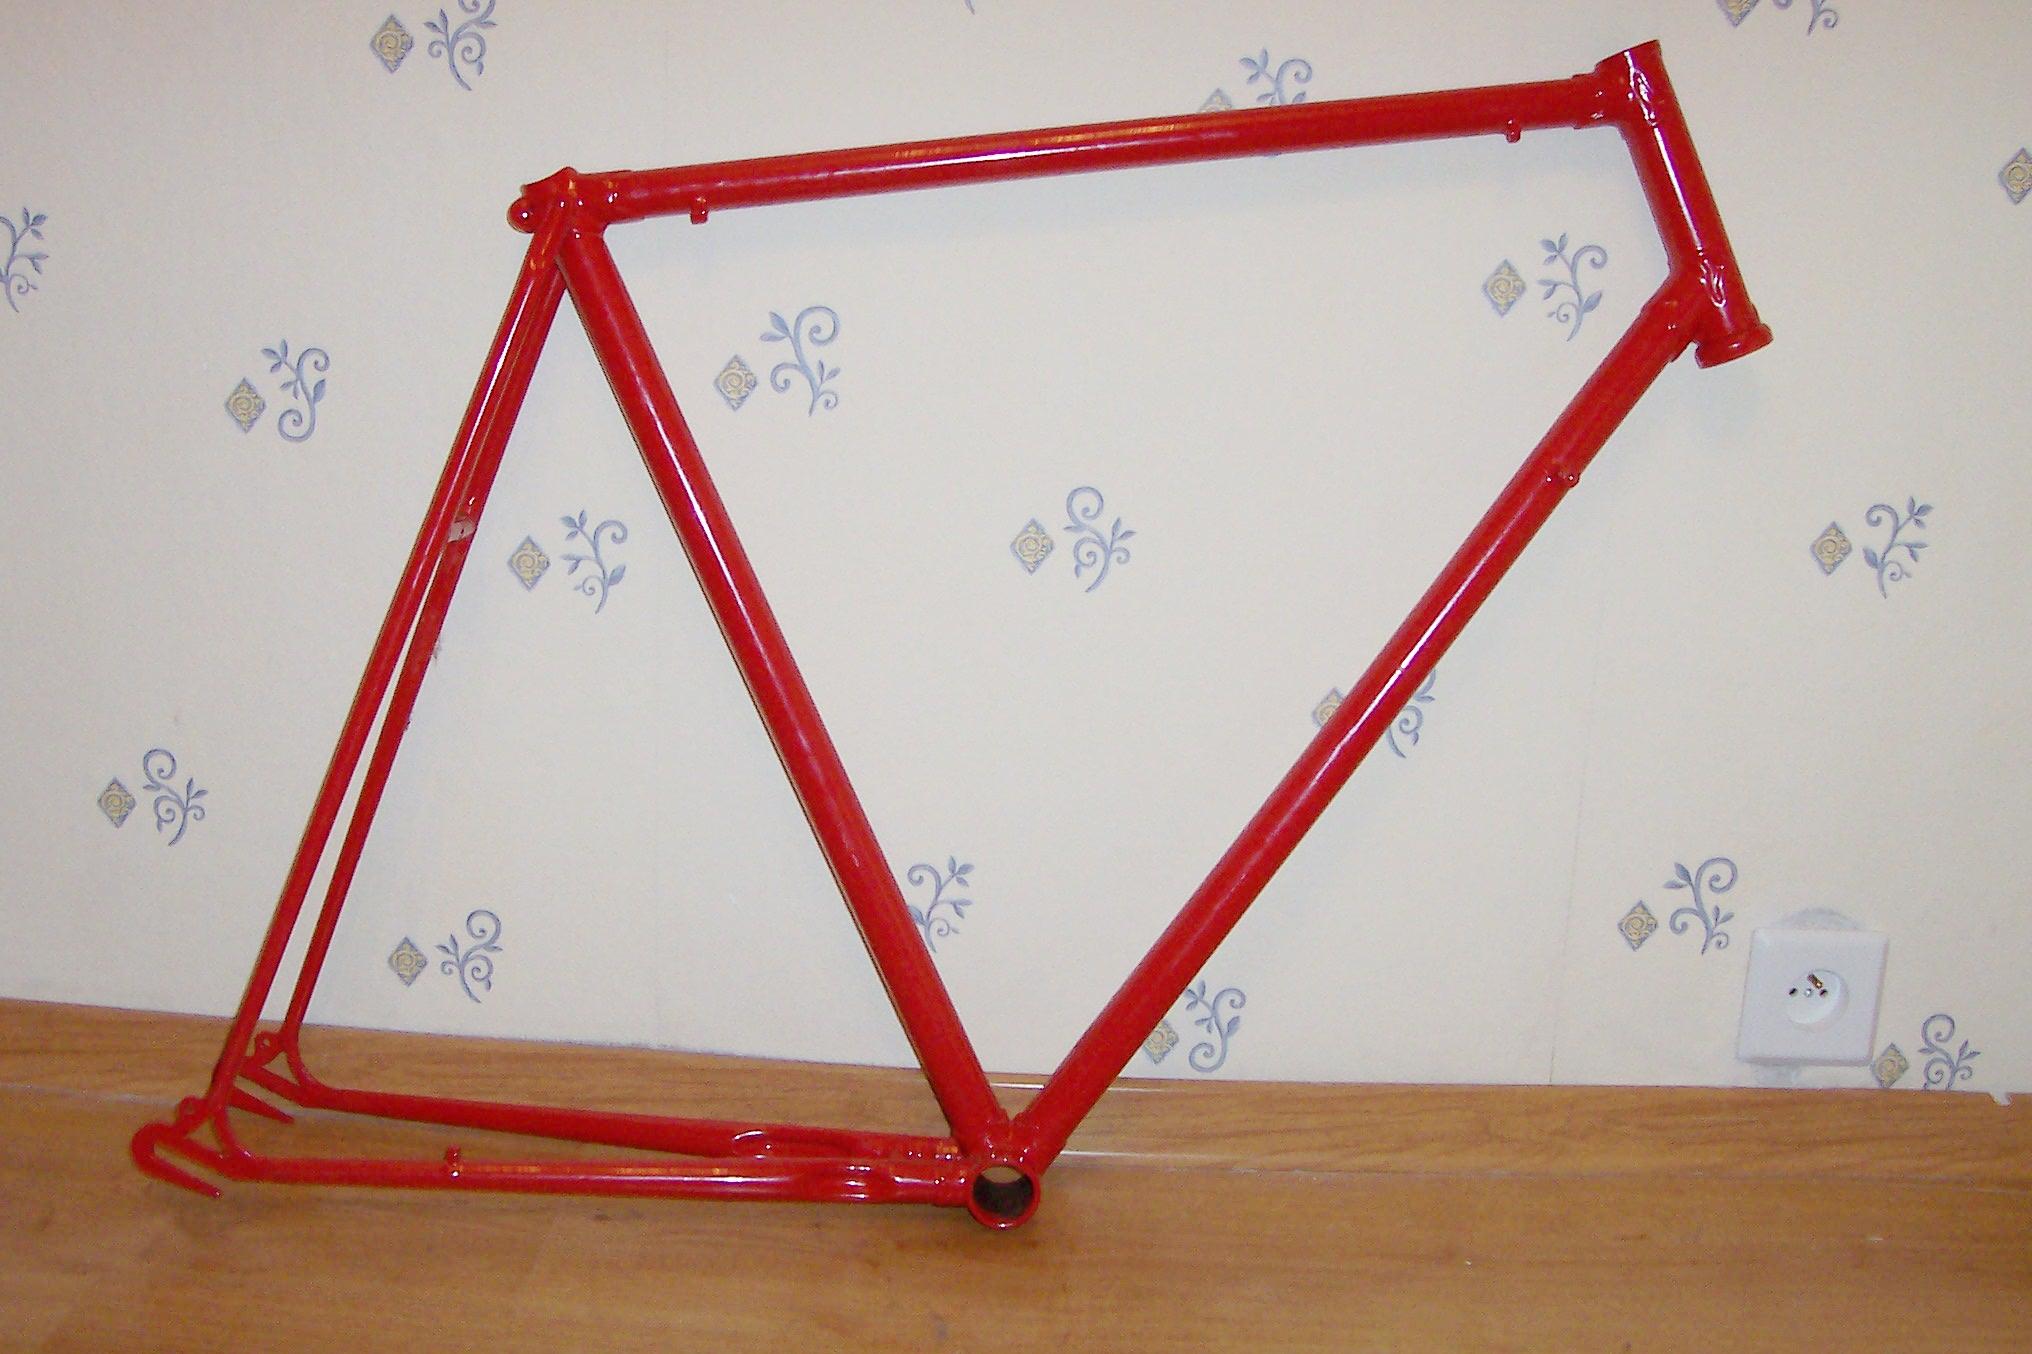 File:Colango bicycle frame.jpg - Wikipedia: it.wikipedia.org/wiki/file:colango_bicycle_frame.jpg